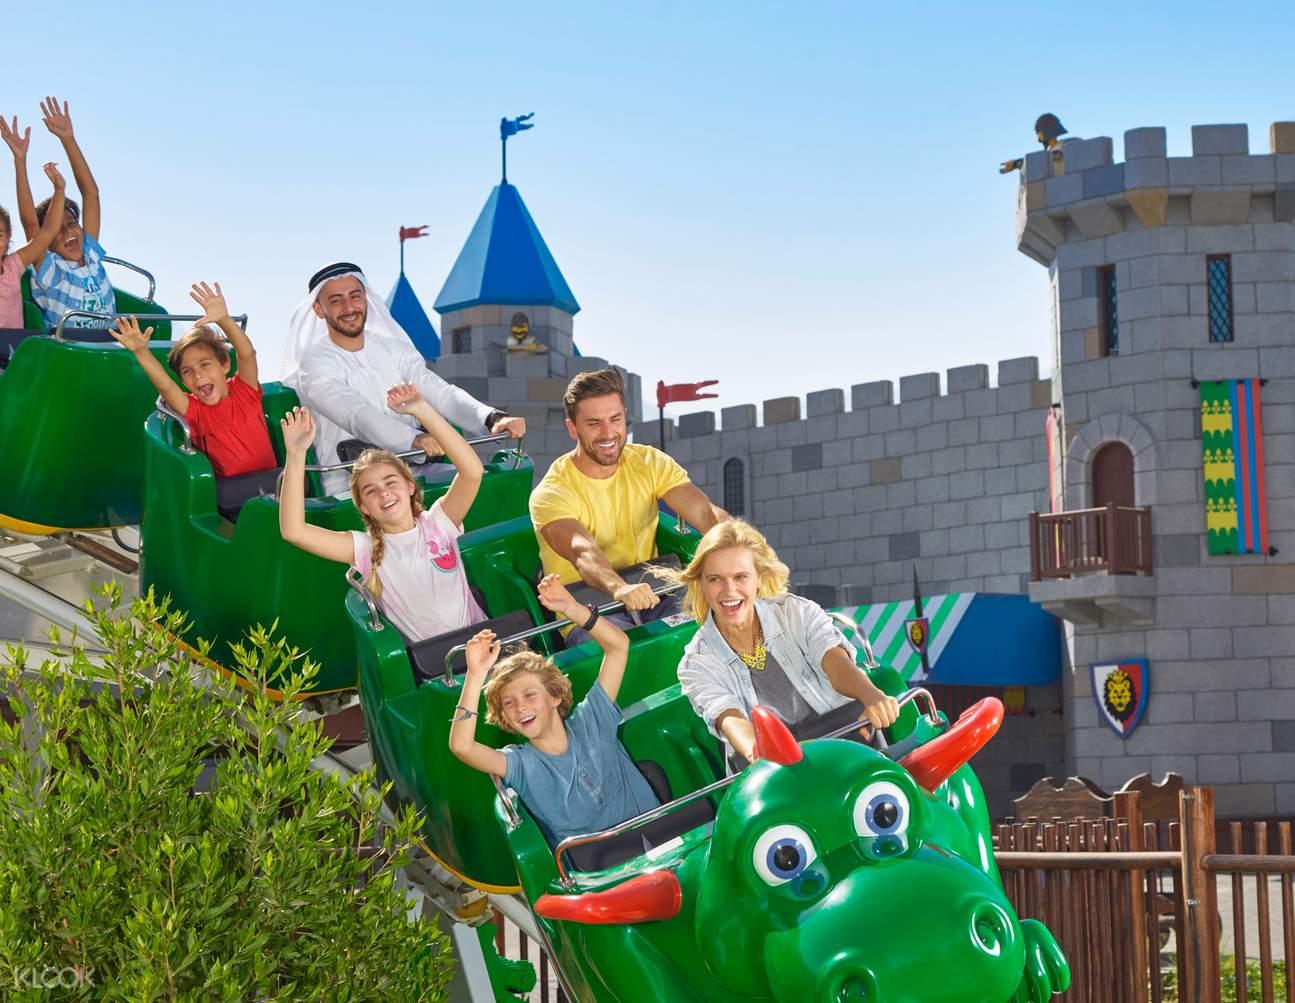 Roller coaster legoland